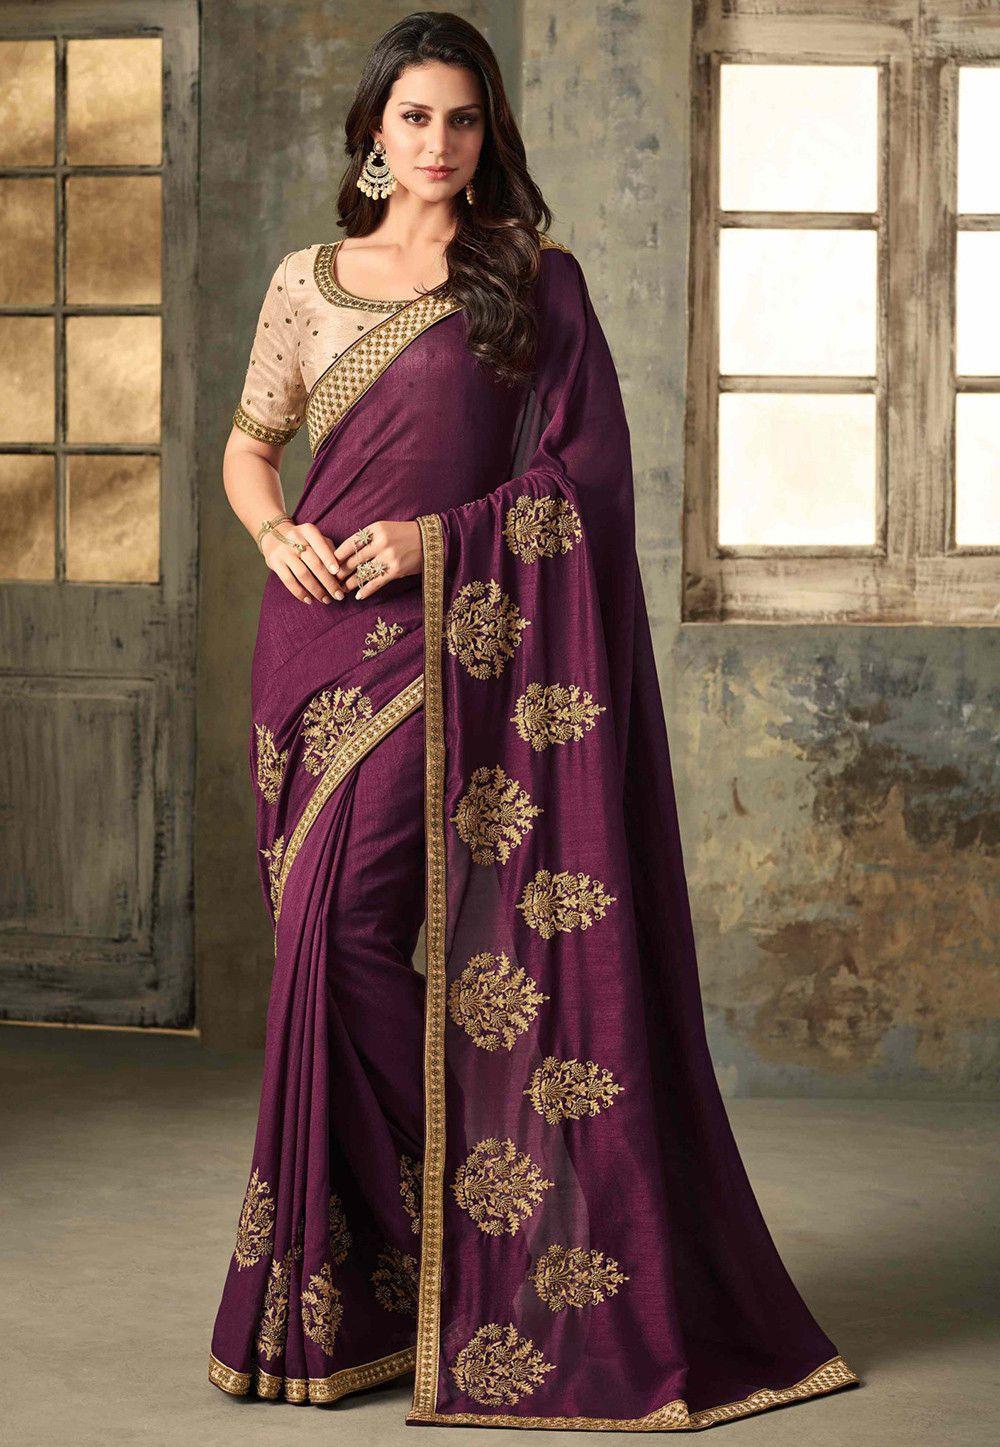 42cdf998f6 Buy Embroidered Art Silk Saree in Wine online, Item code: SYC7971, Color:  Purple, Occasion: Party, Festive, Work: Contemporary, Zari, Fabric: Art Silk,  ...